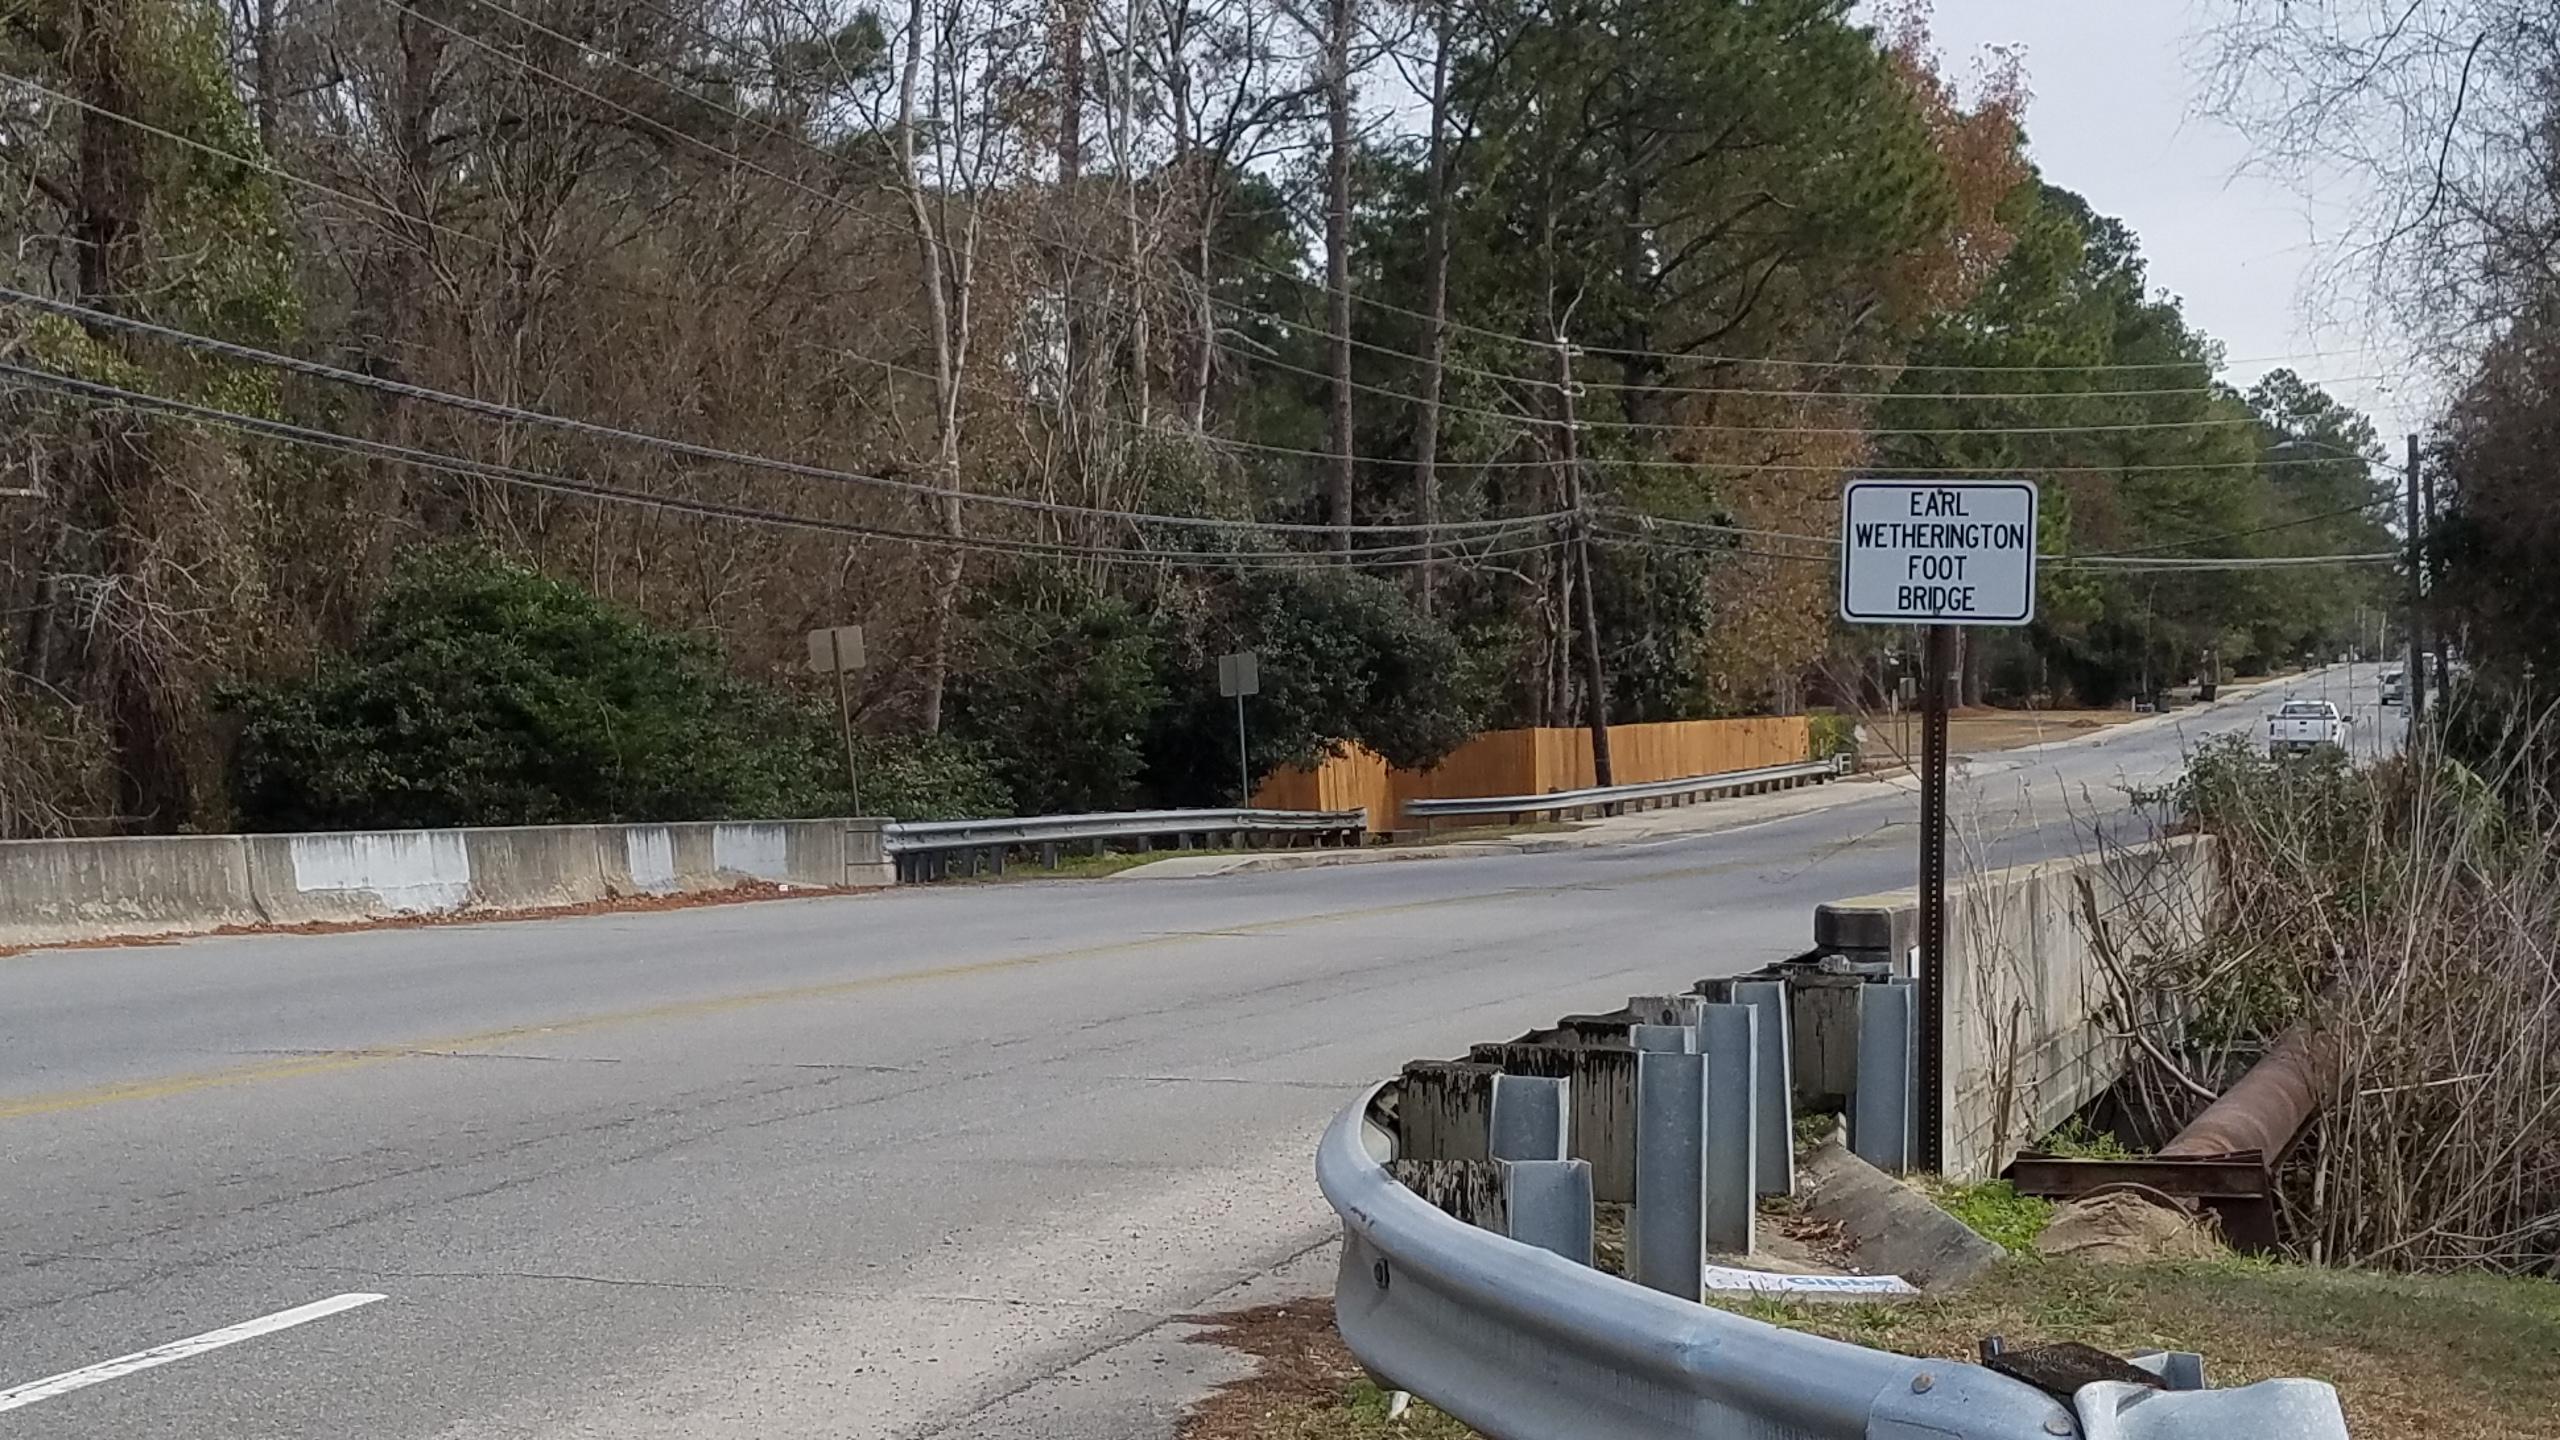 2560x1440 Bridge, Over Sugar Creek, in Earl Wetherington Foot Bridge, by John S. Quarterman, for WWALS.net, 8 January 2018